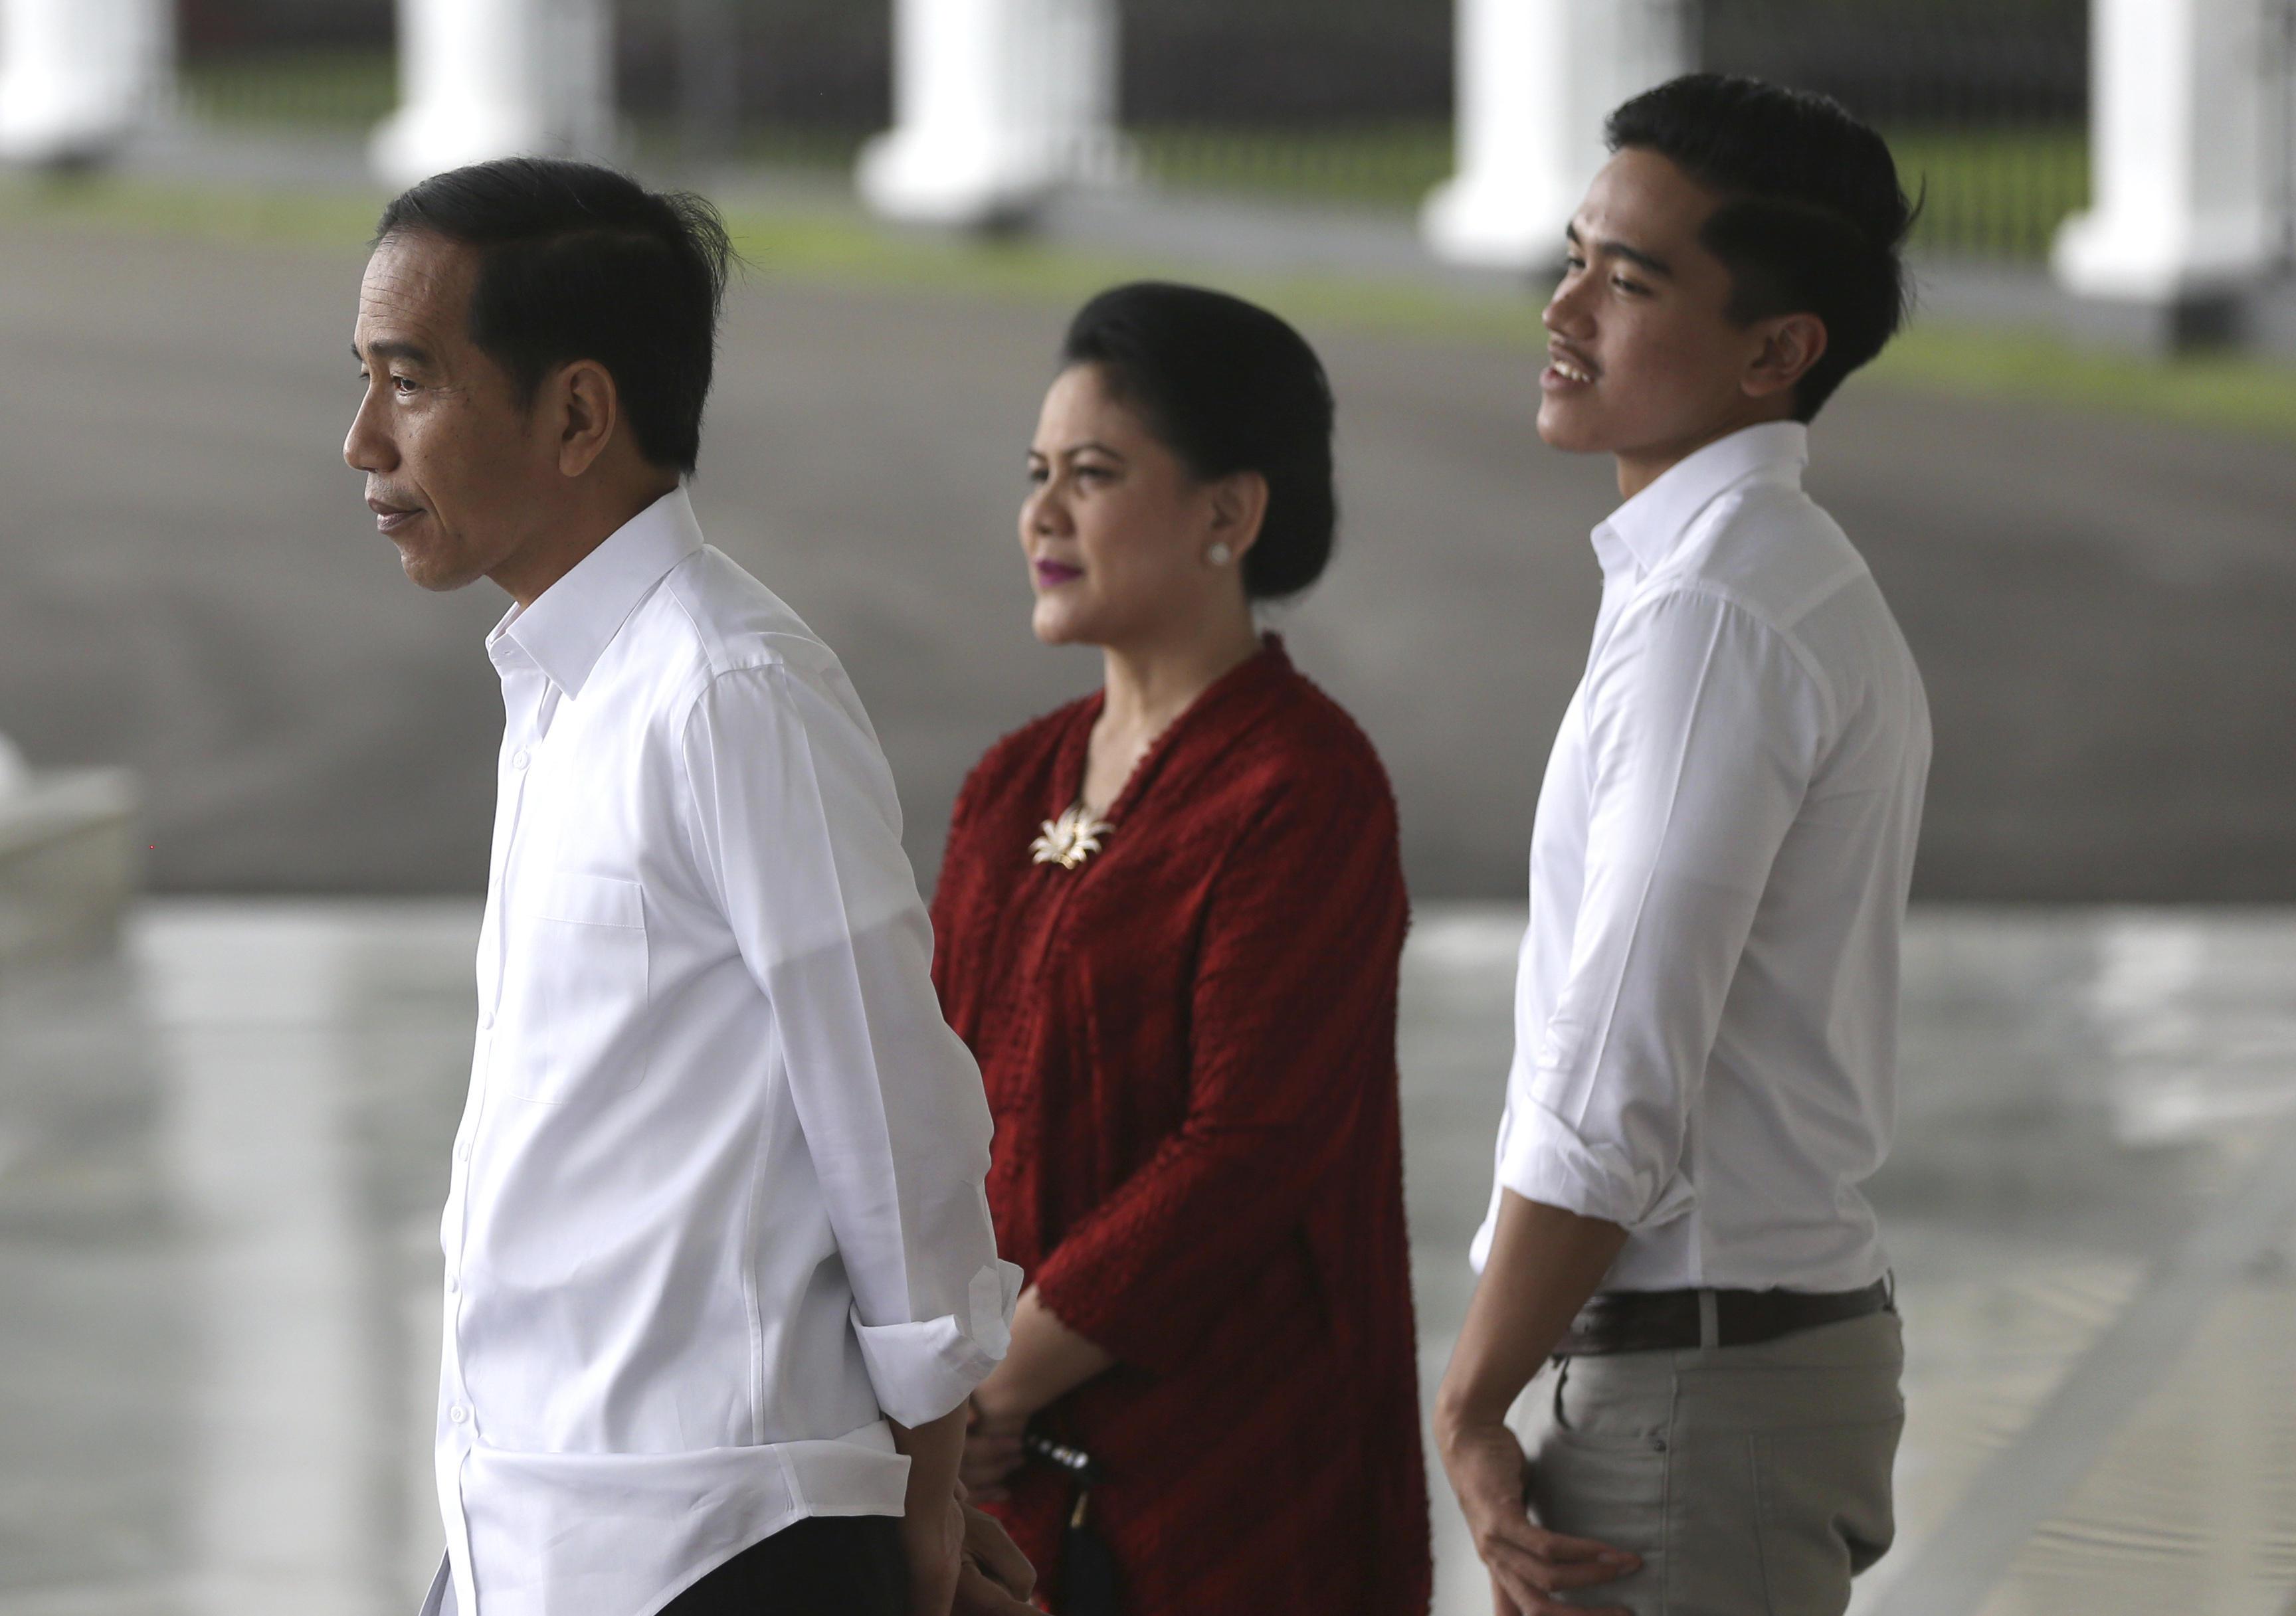 Indonesia President Joko Widodo son Kaesang Pangarep